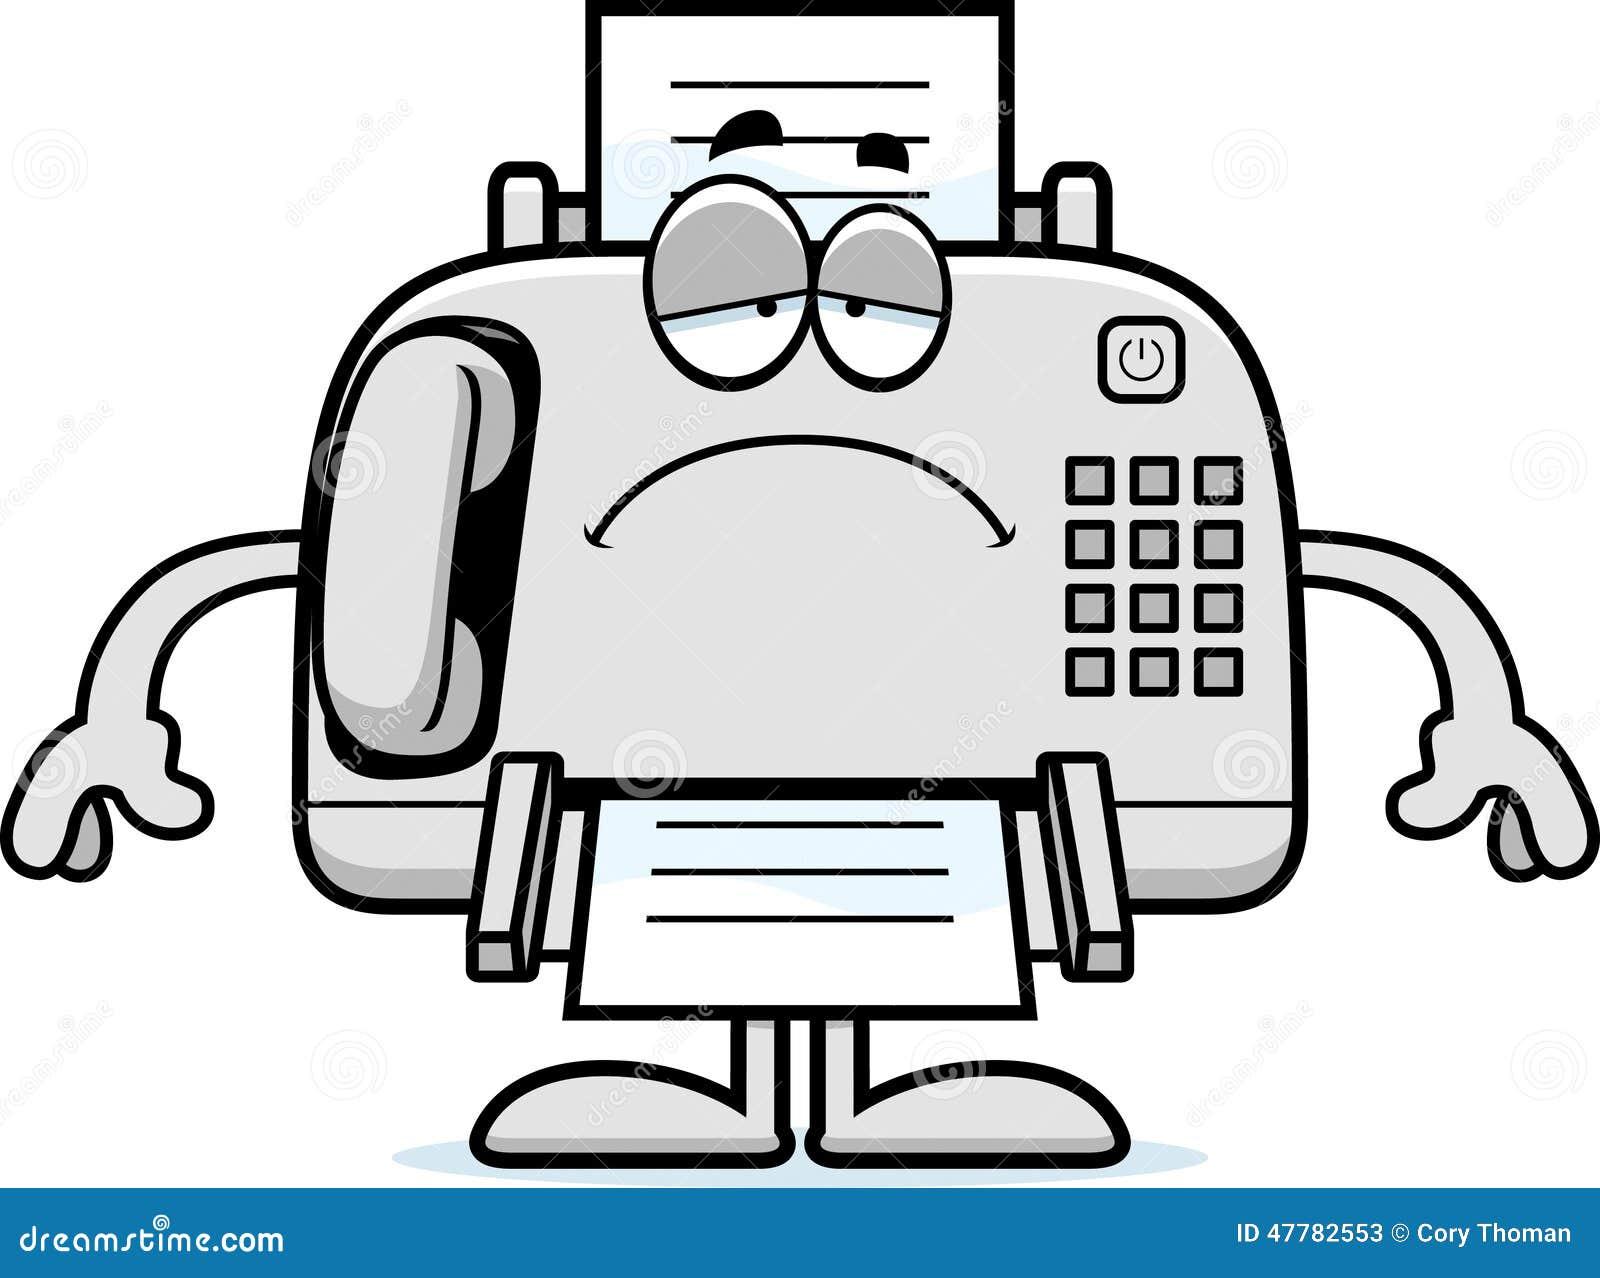 Sad Cartoon Fax Machine Stock Vector - Image: 47782553